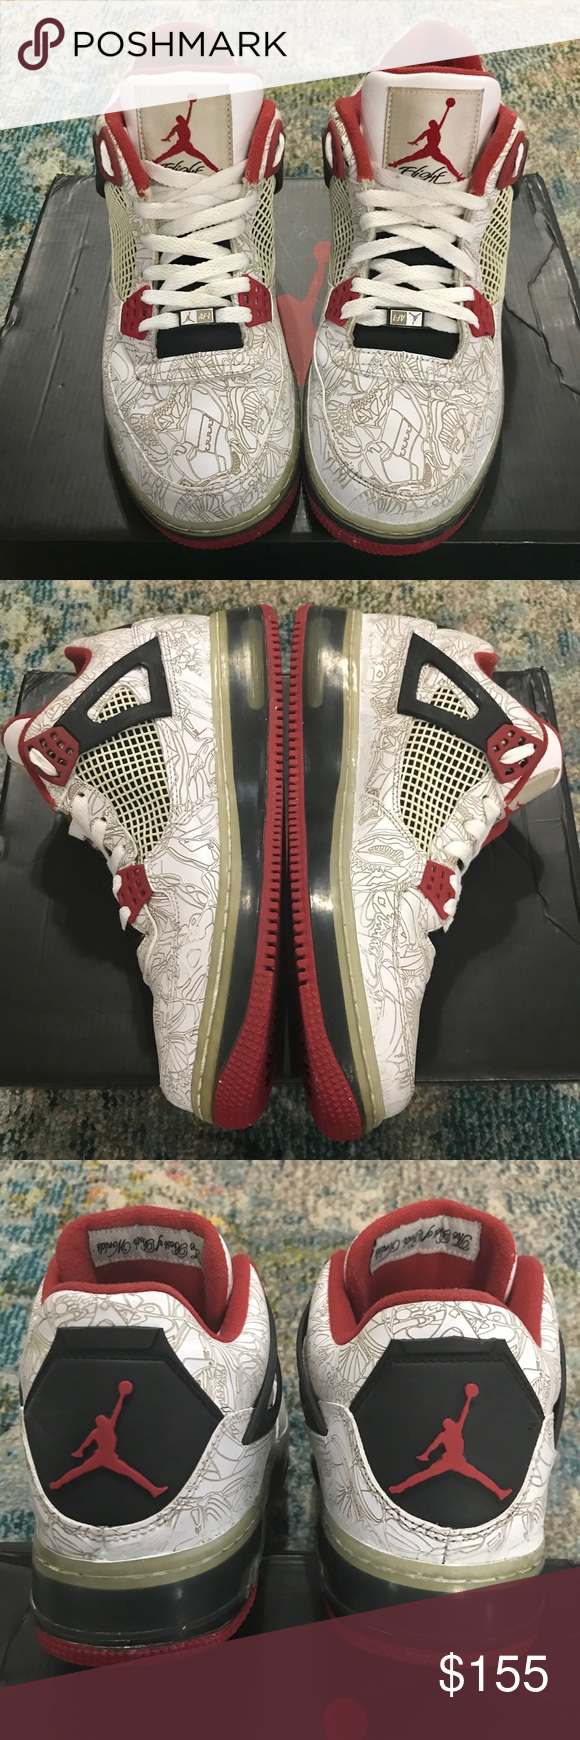 Jordan 4 Laser (Best Of Both Worlds